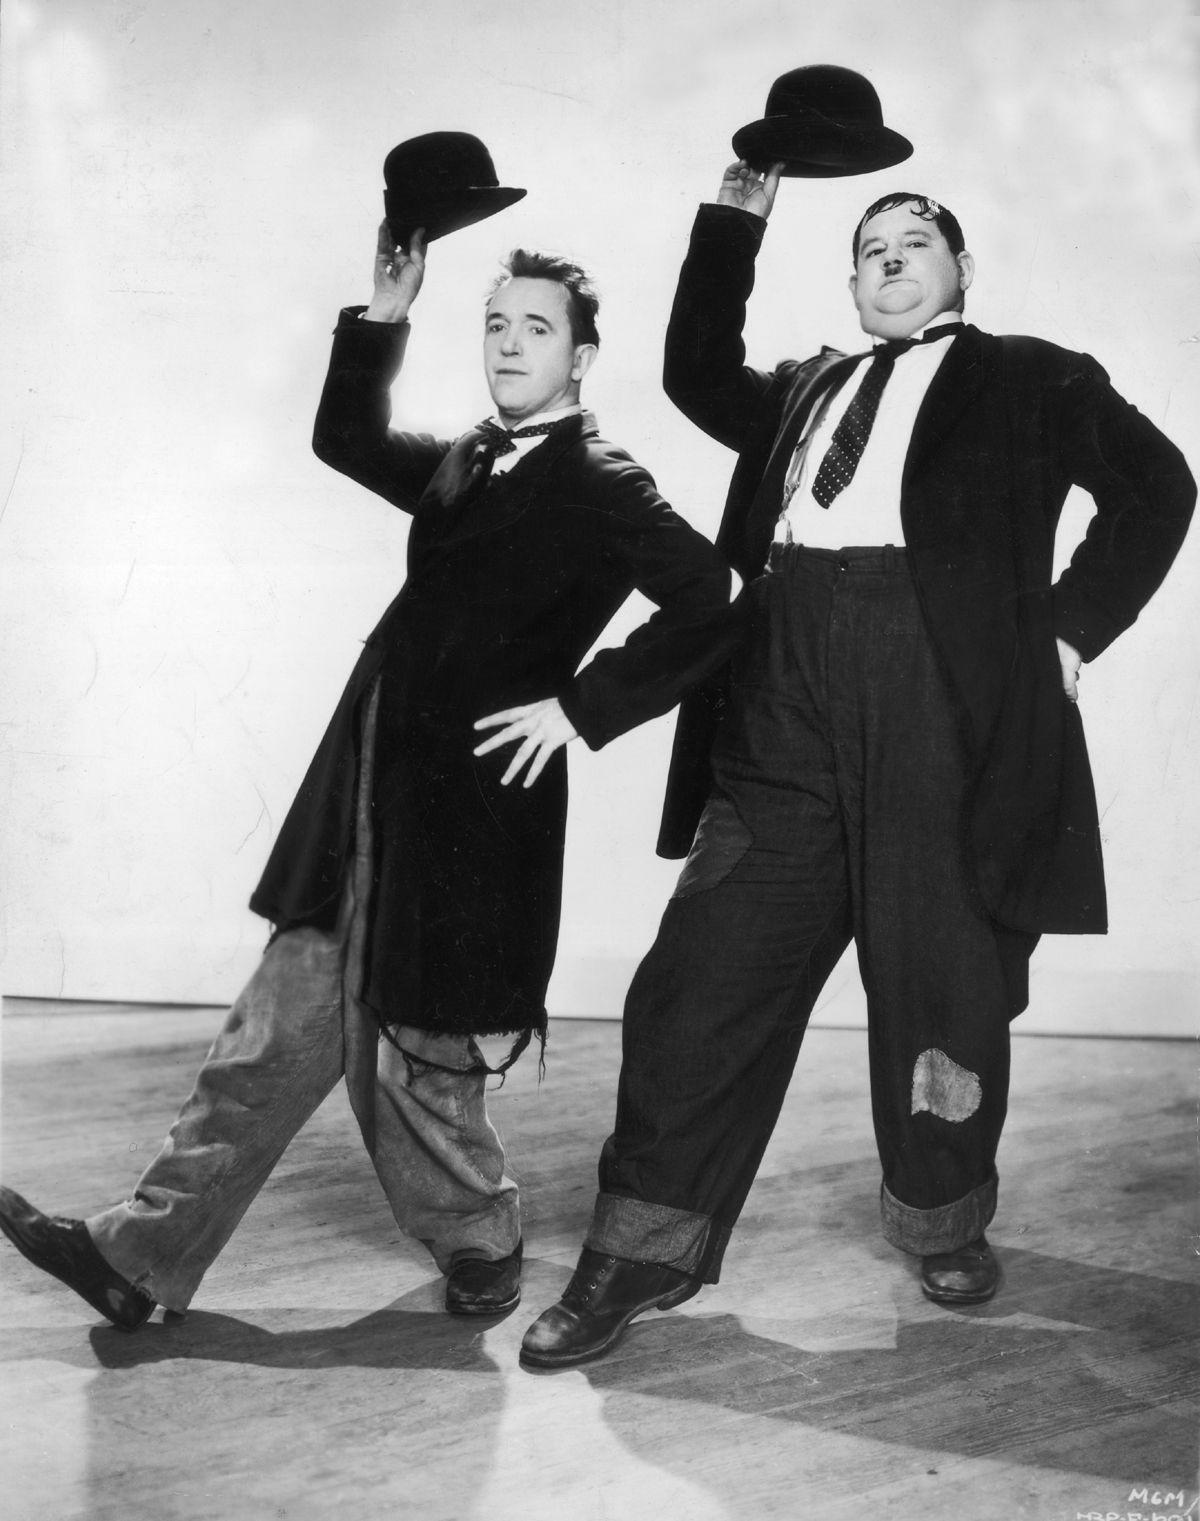 Nom De Laurel Et Hardy : laurel, hardy, Bowler., Ideas, Bowler,, Charles, Spencer, Chaplin,, Bowler